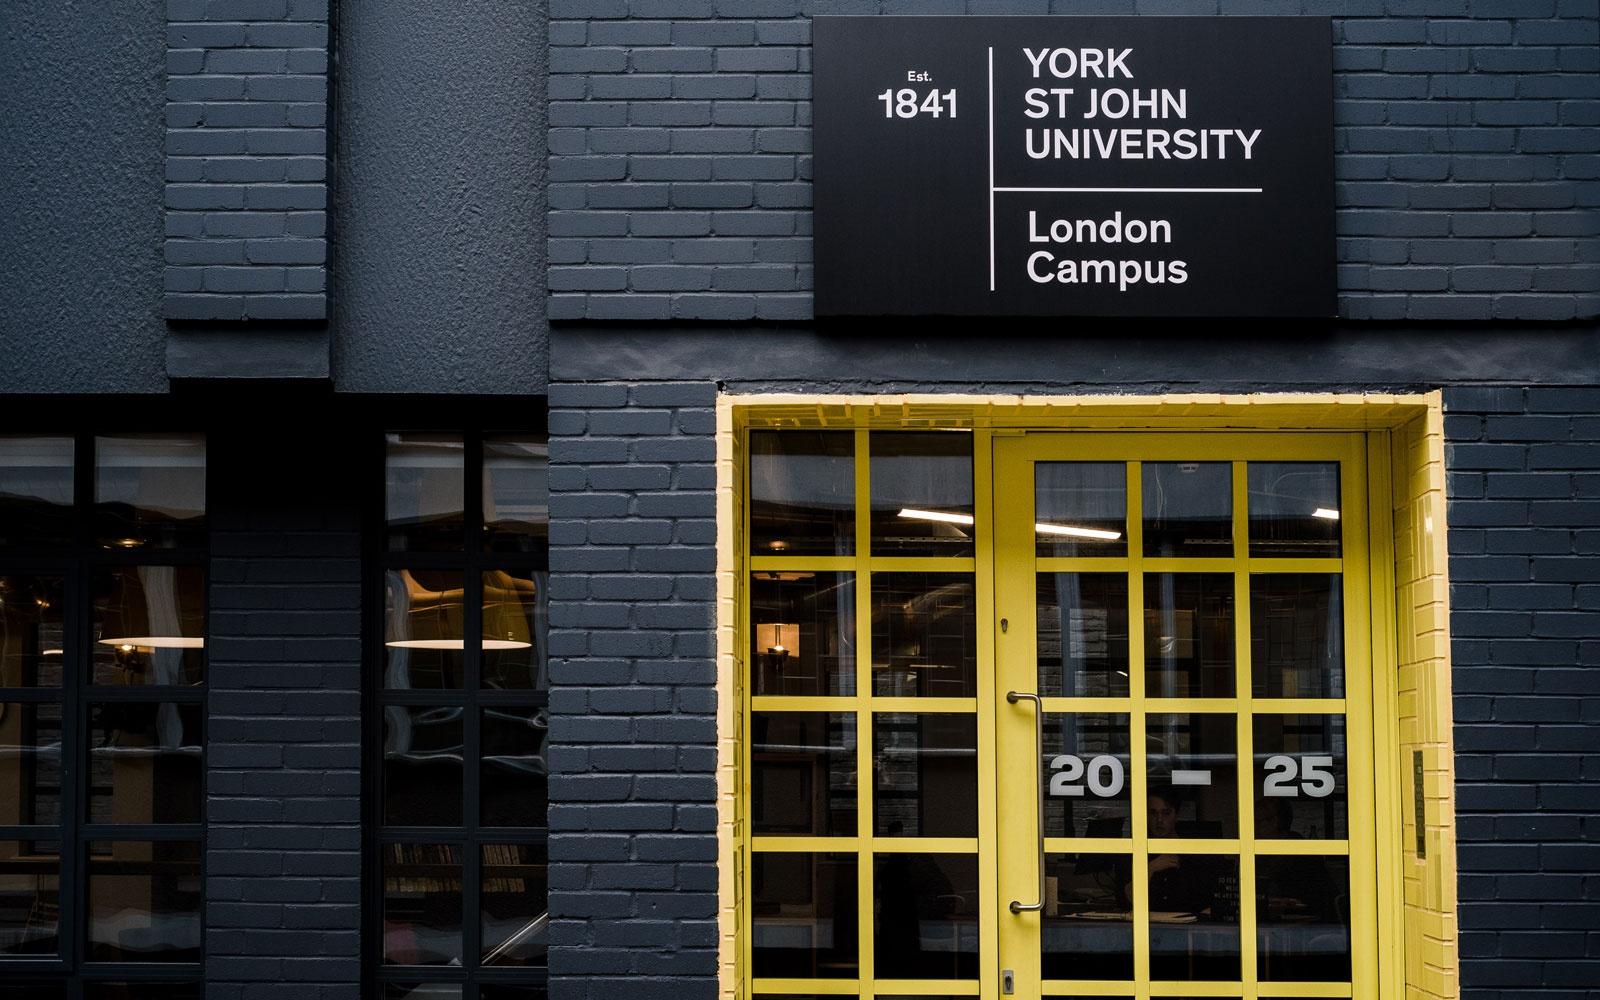 Entrance to the York St John University London Campus